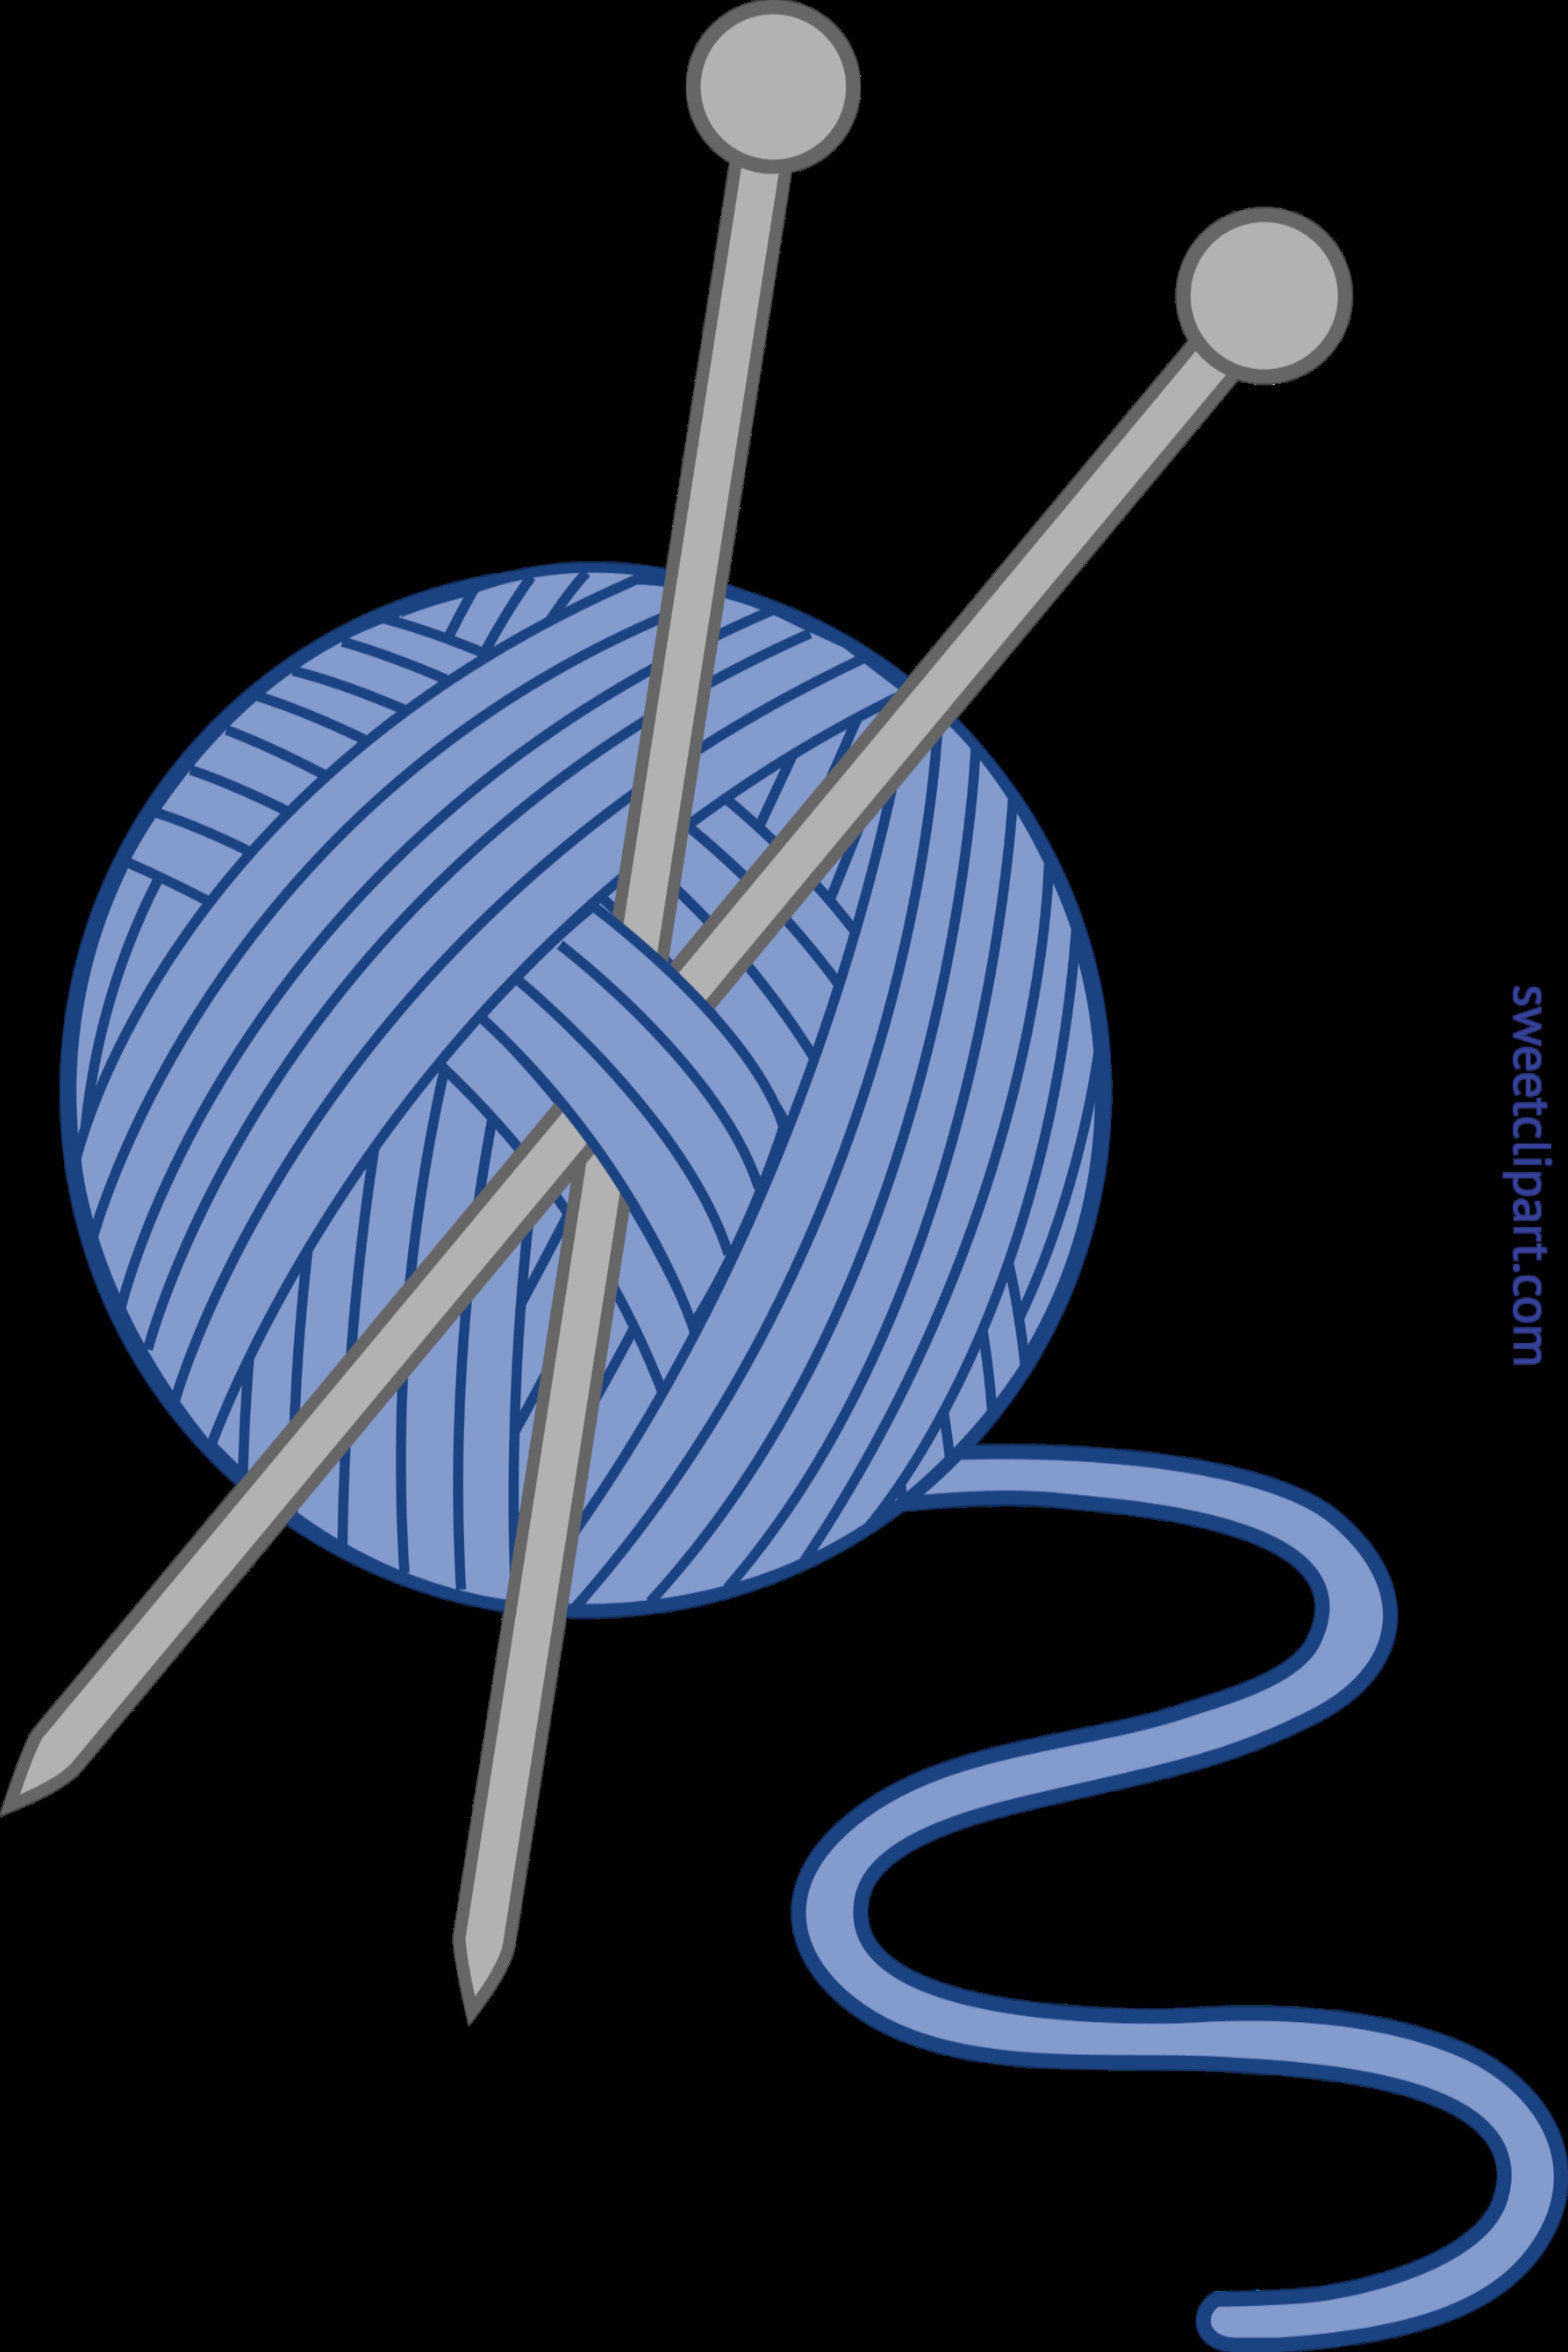 3206x4809 Knitting Yarn Needles Blue Clip Art